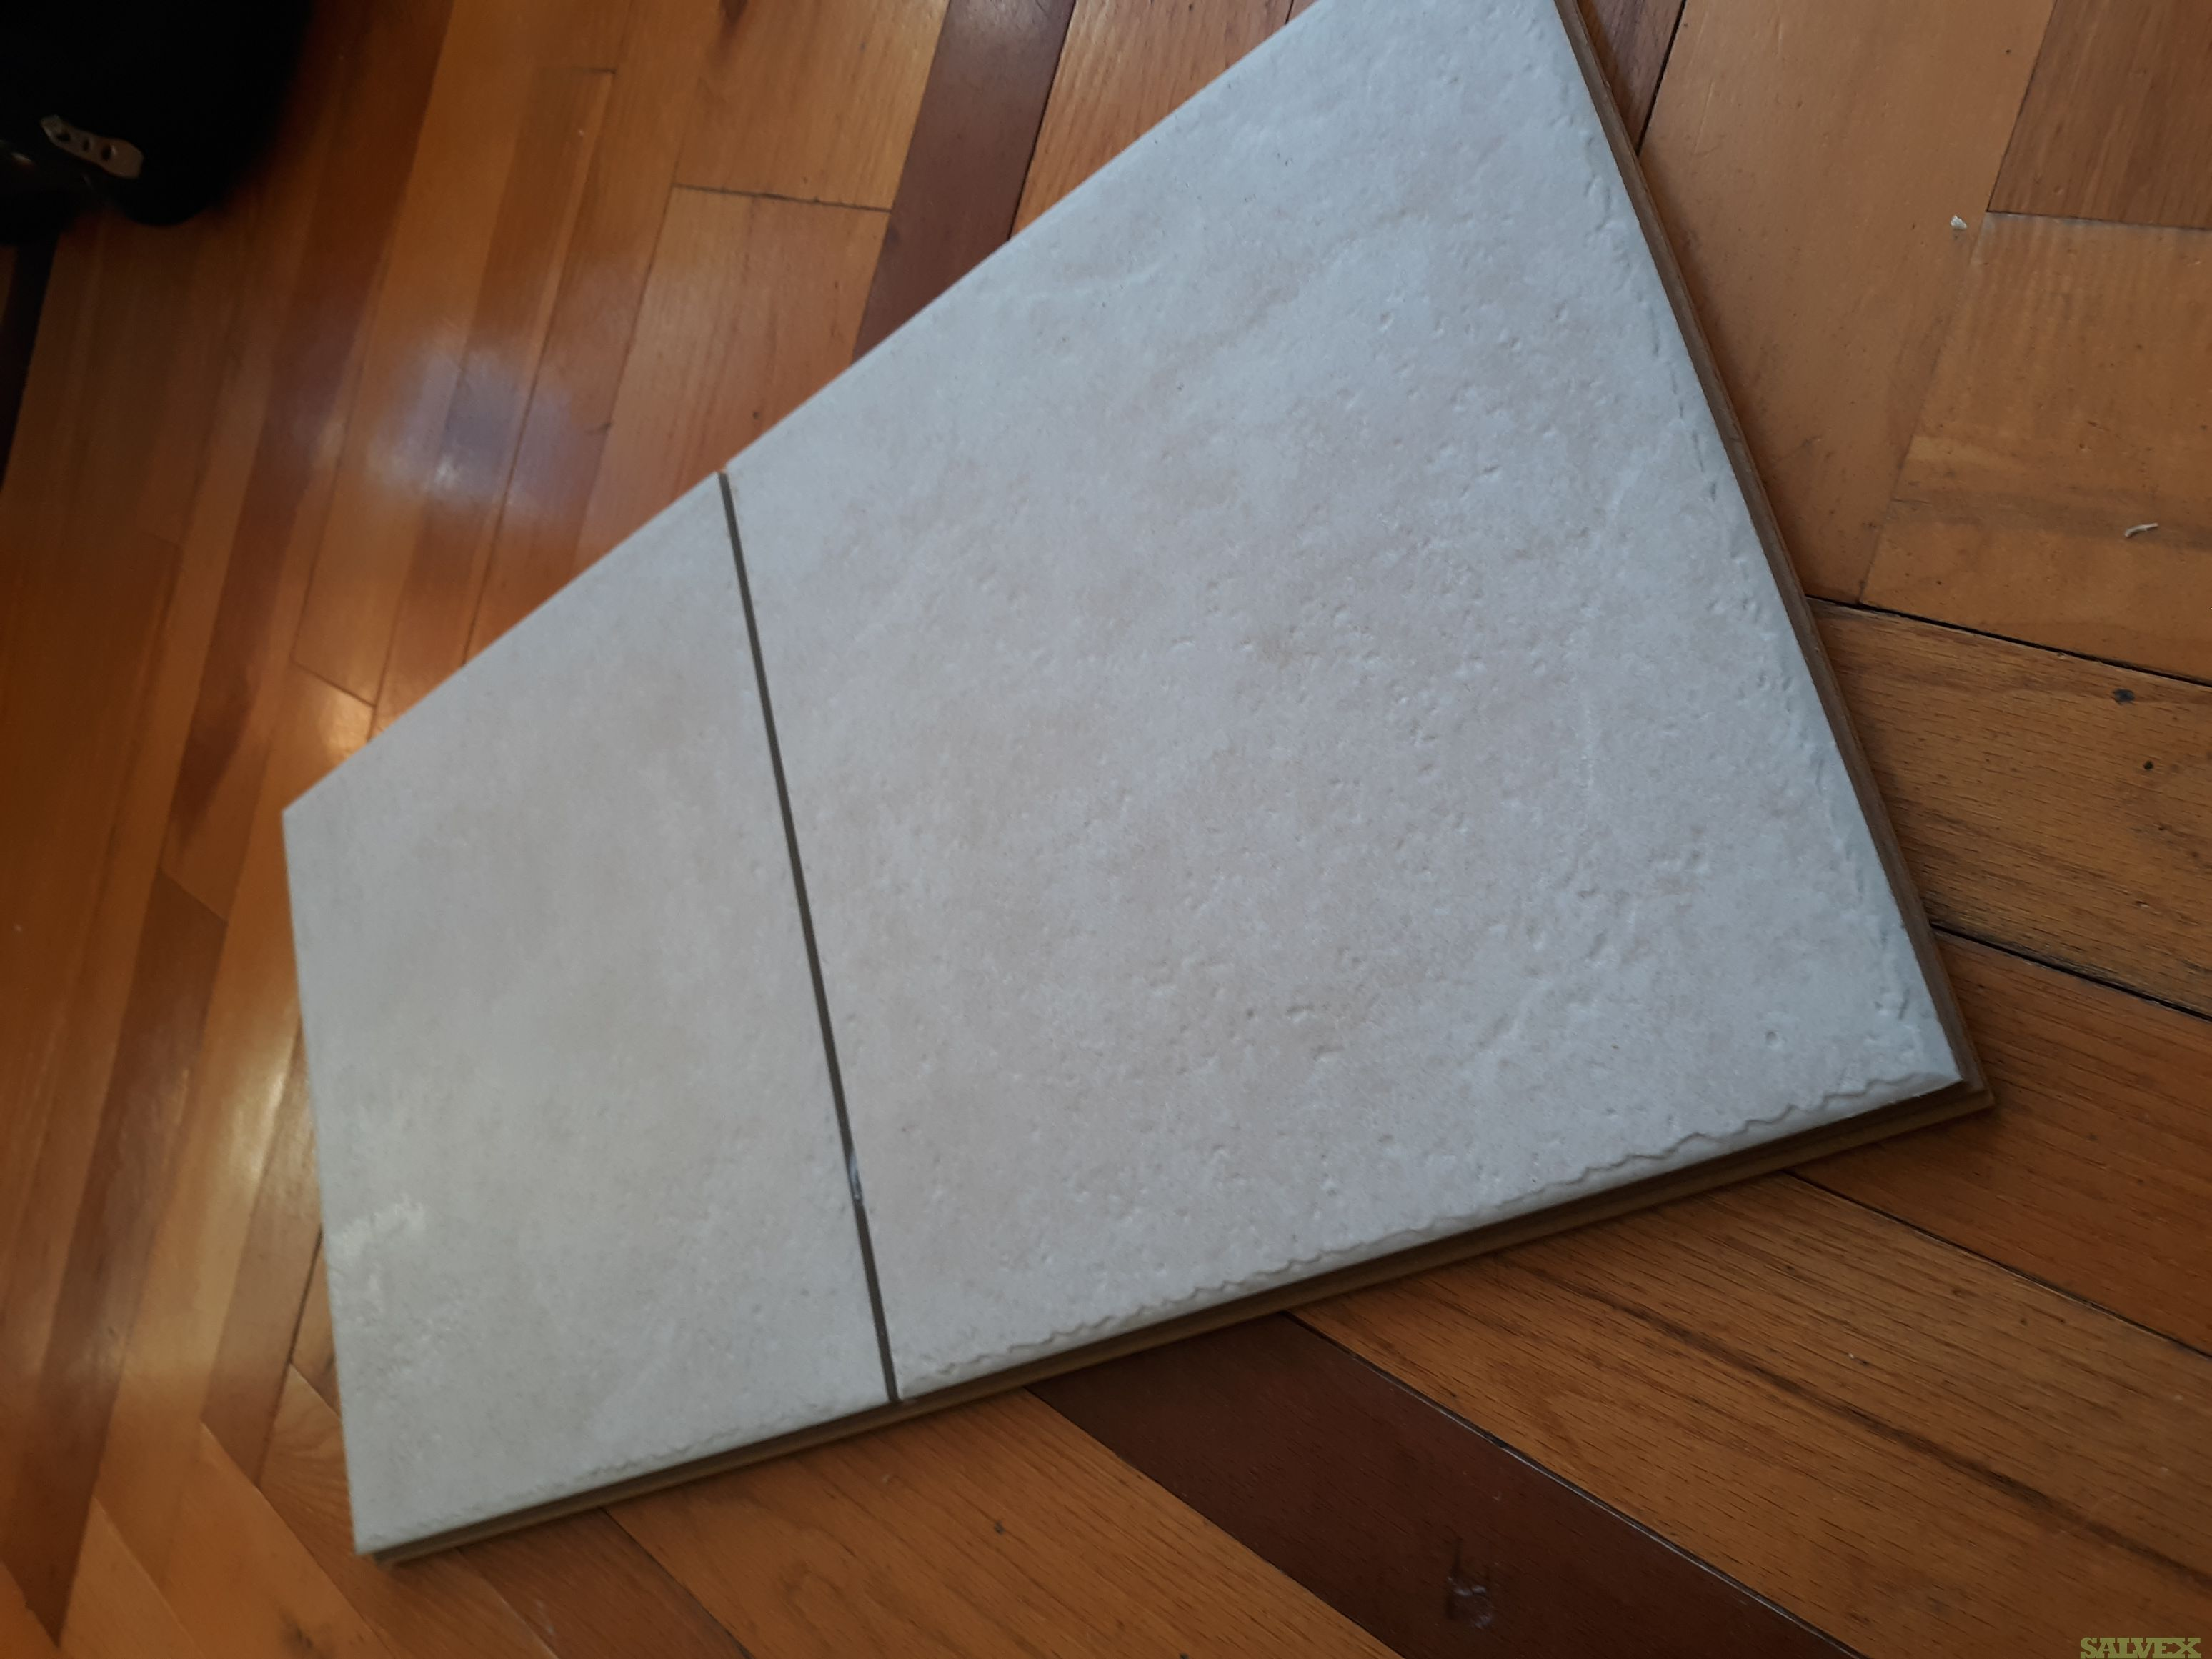 Edge Floating Flooring Porcelain Tiles (6,500 Sqft) in  Southeastern Connecticut